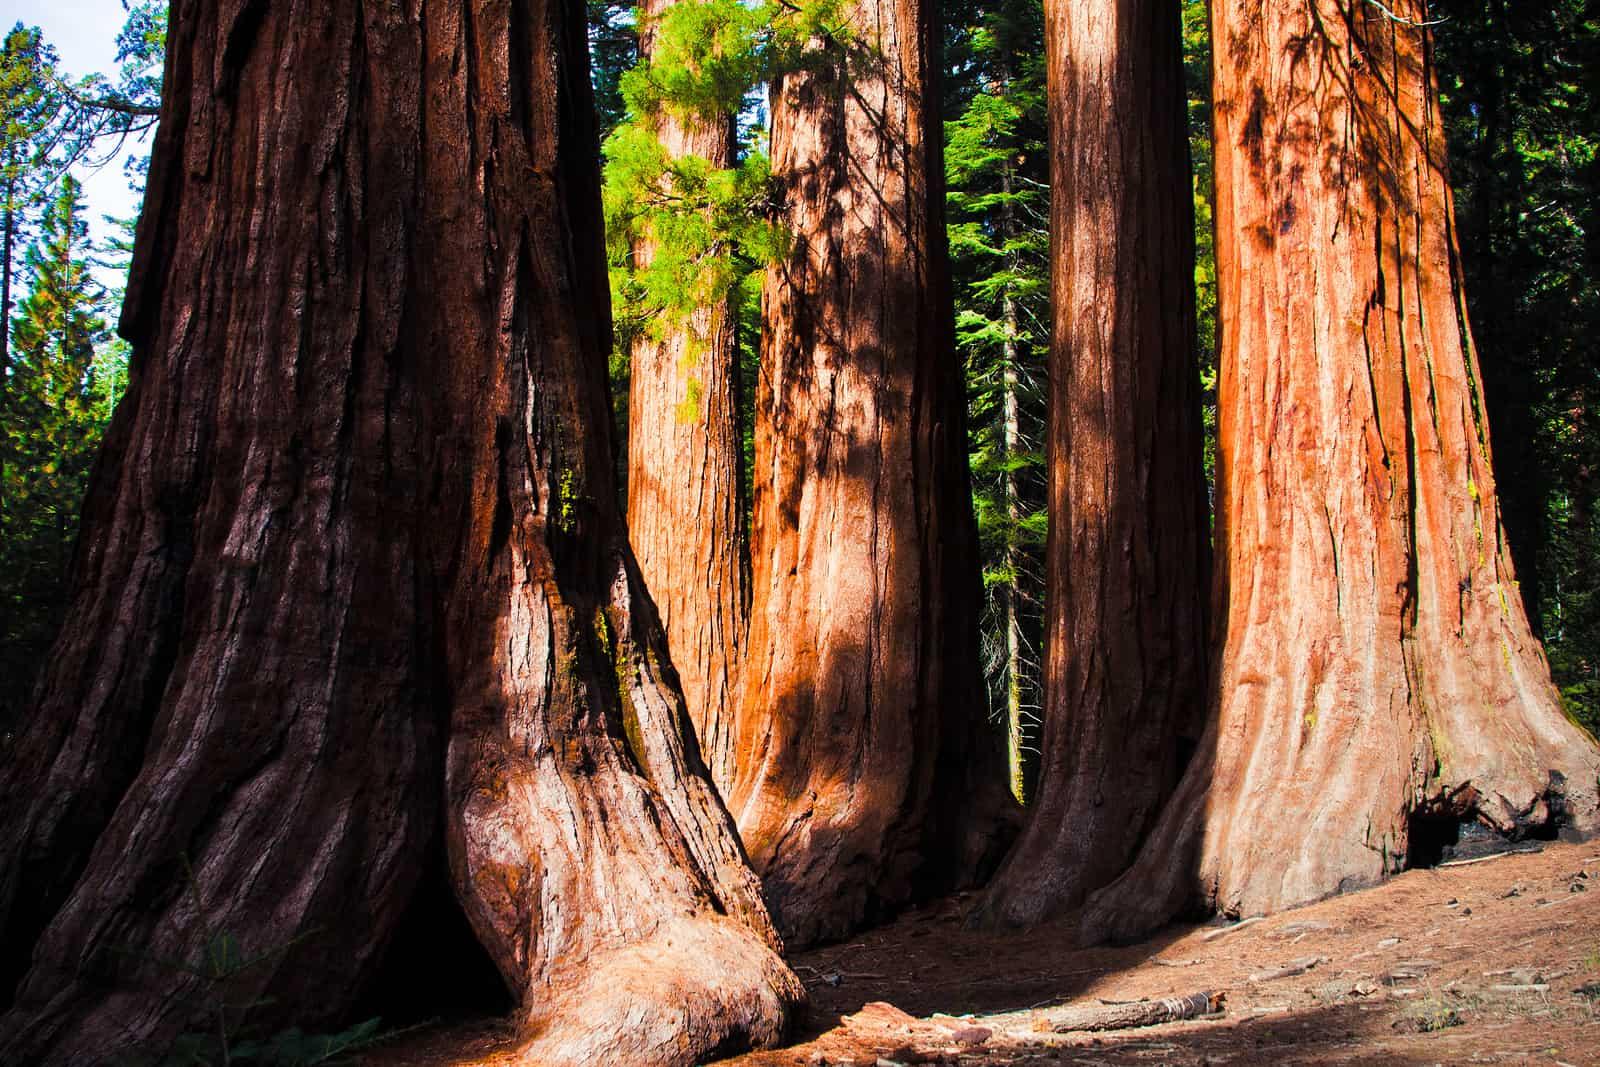 https://i1.wp.com/www.theparadigmrealtygroup.com/wp-content/uploads/2017/10/bigstock-Giant-Sequoias-in-Yosemite-Nat-45266944.jpg